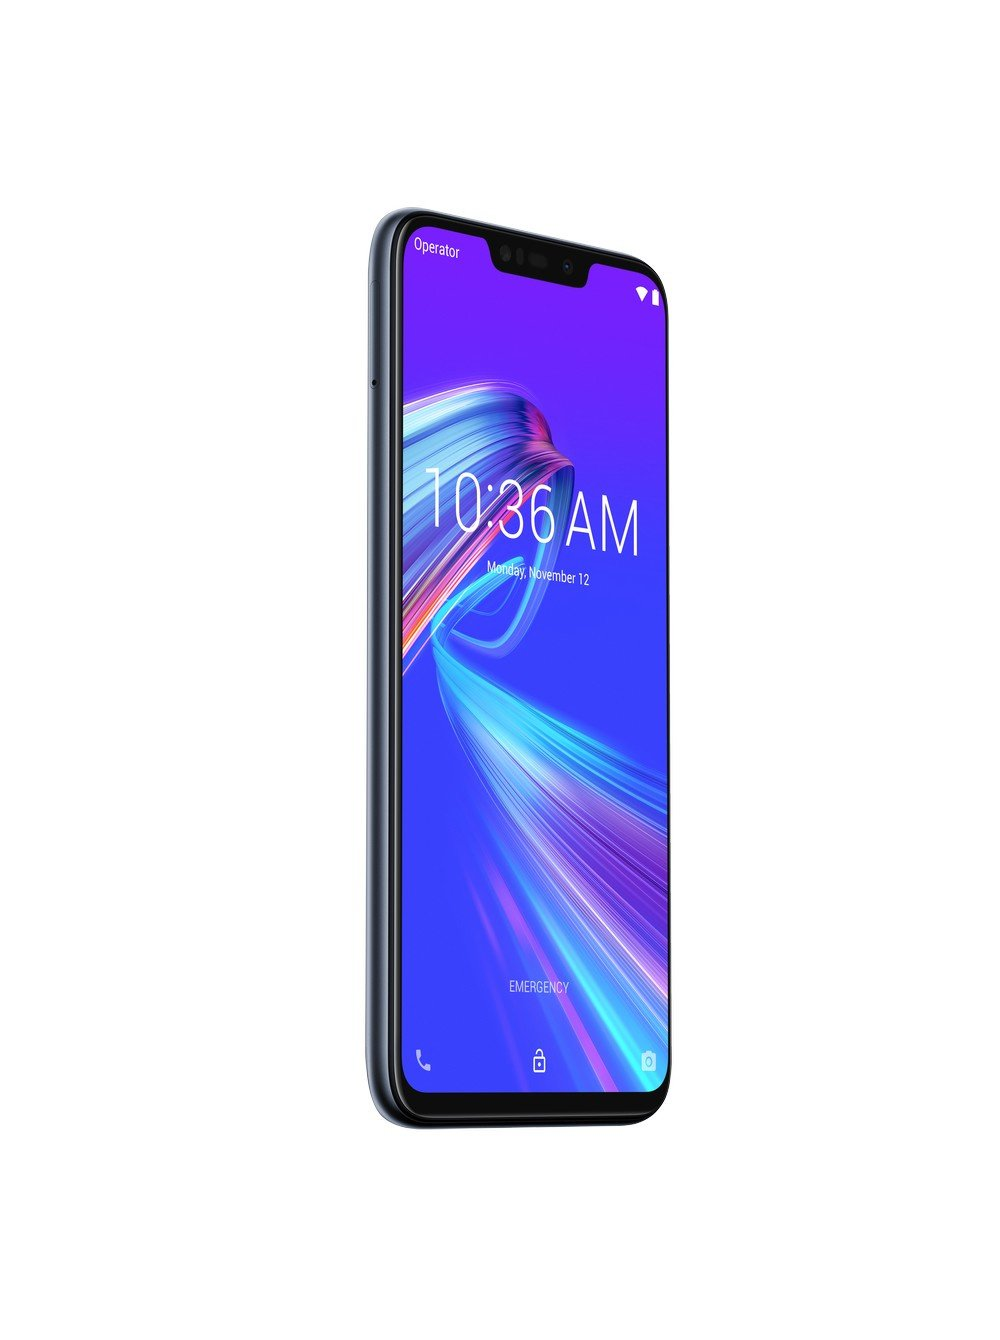 Смартфон Asus ZenFone Max (M2) (ZB633KL-4A070EU) 4/32 GB DUALSIM Black с чехлом фото 2